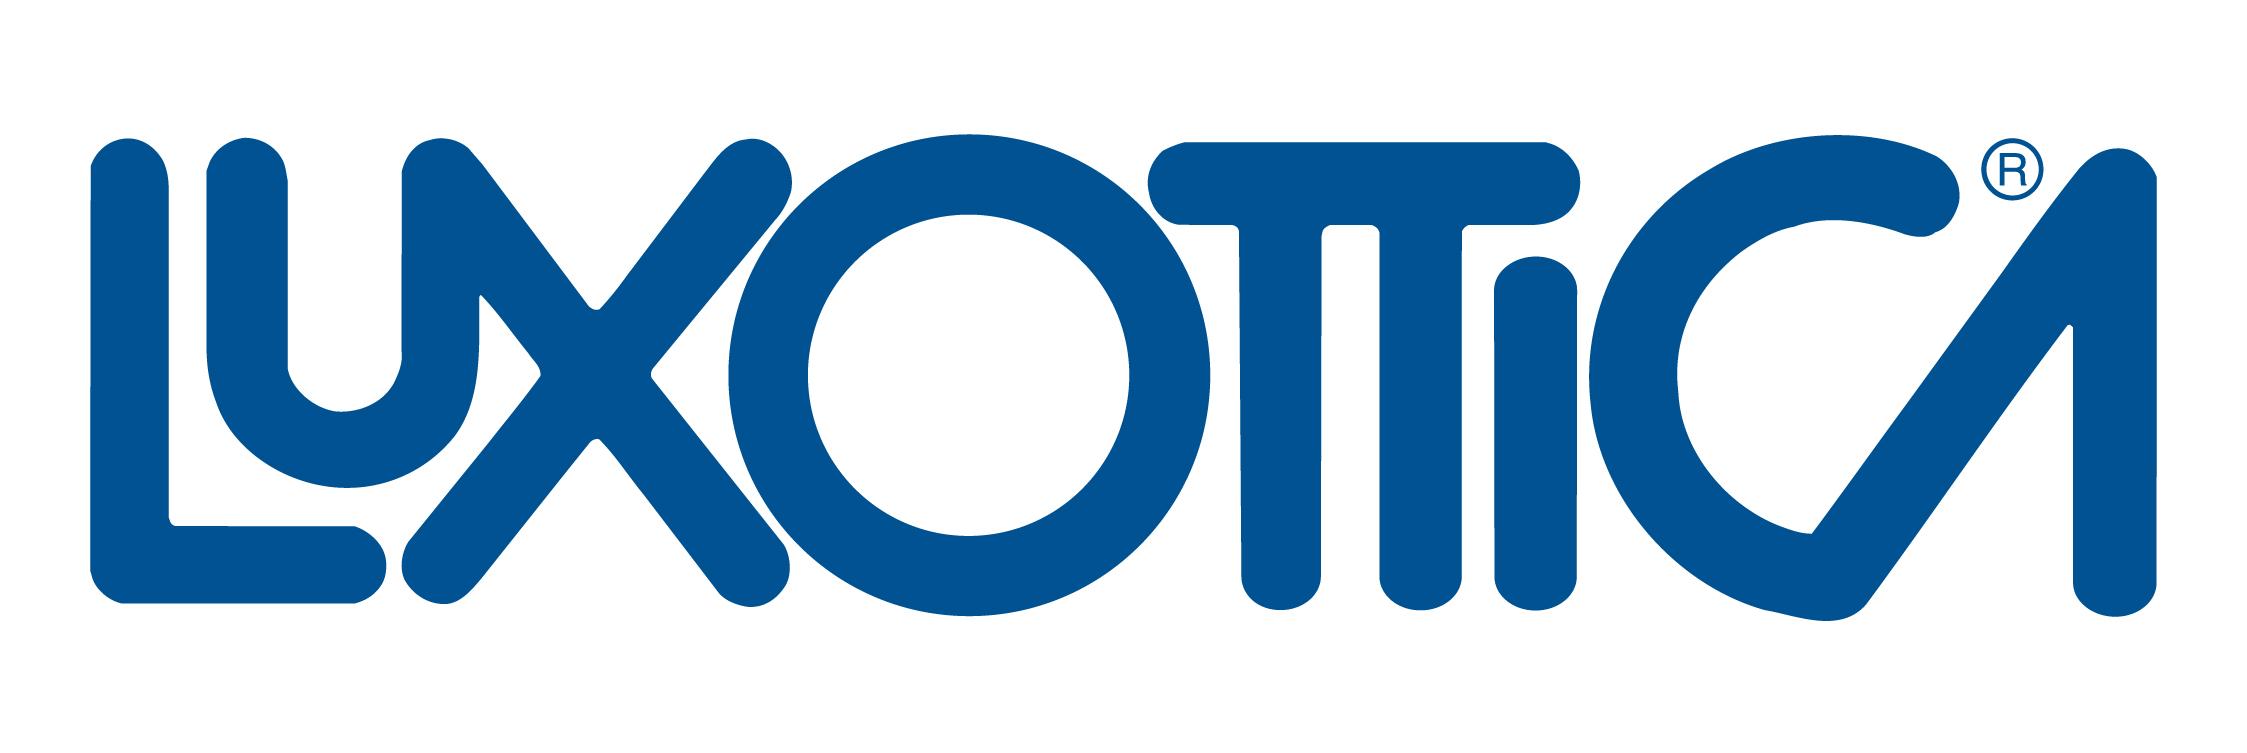 Luxottica Logo Wallpaper